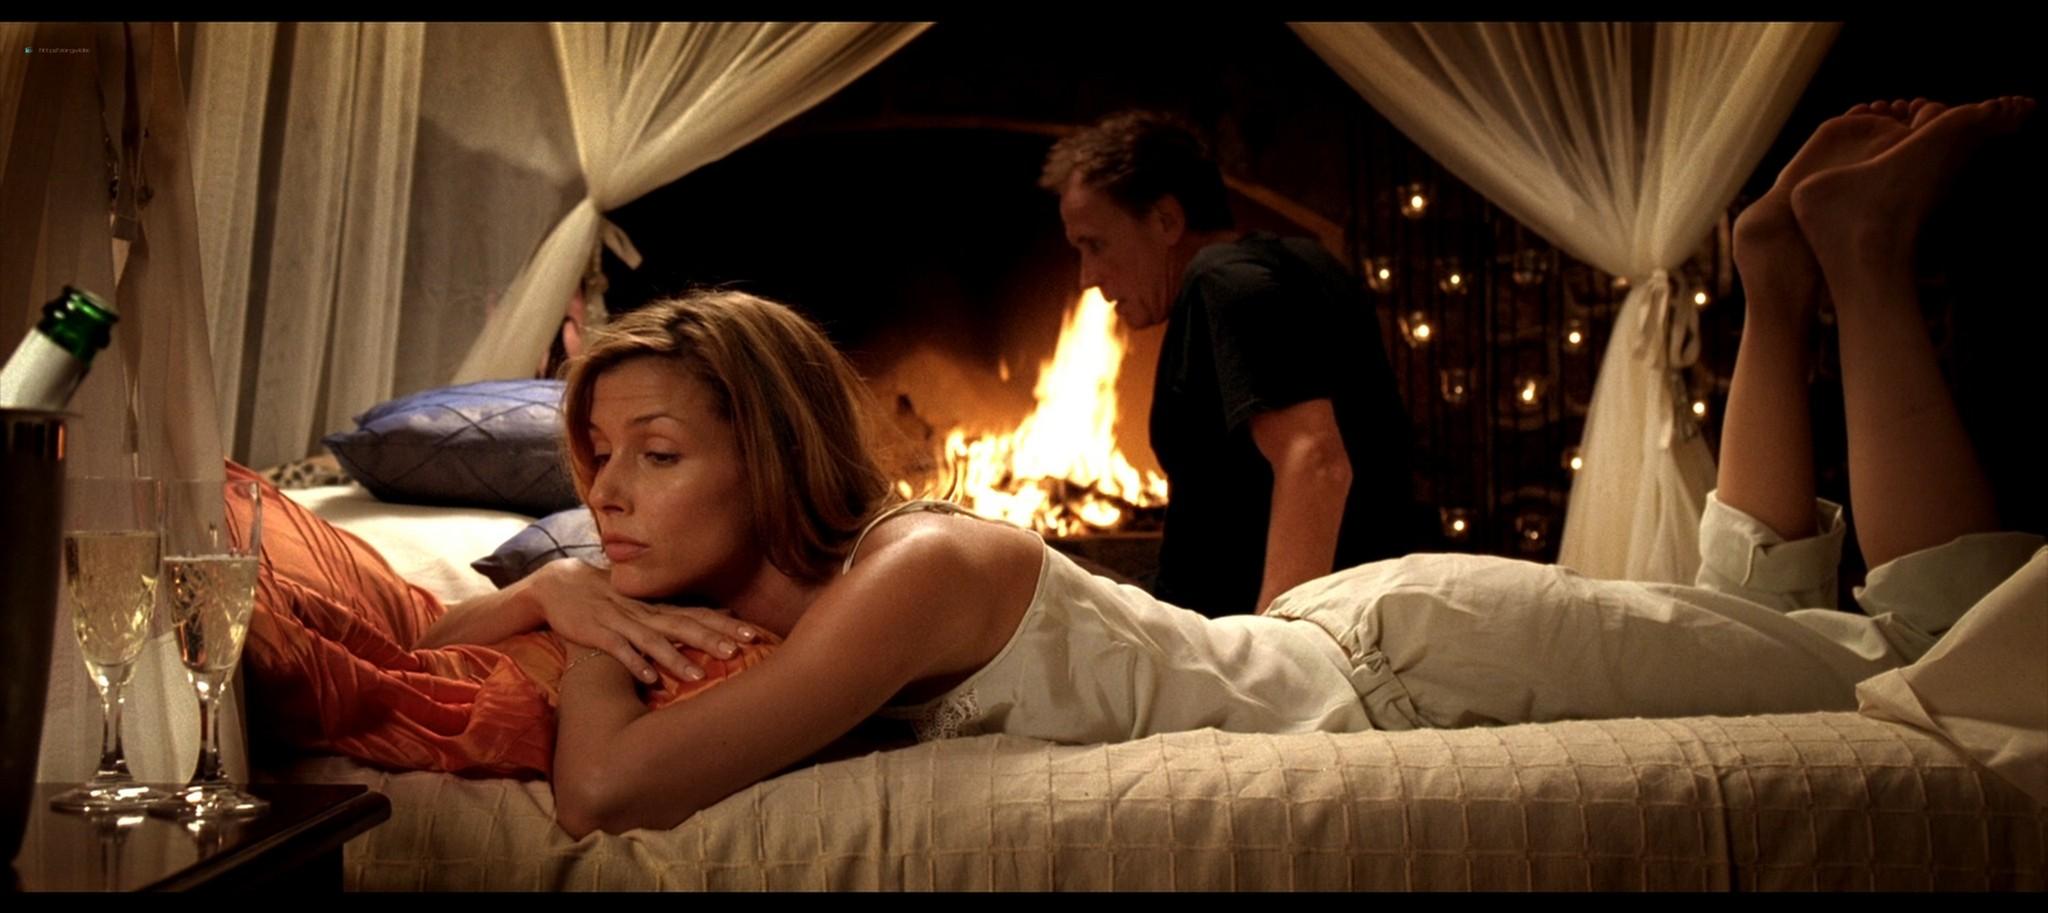 Bridget Moynahan hot and sexy Prey 2007 1080p BluRay REMUX 6